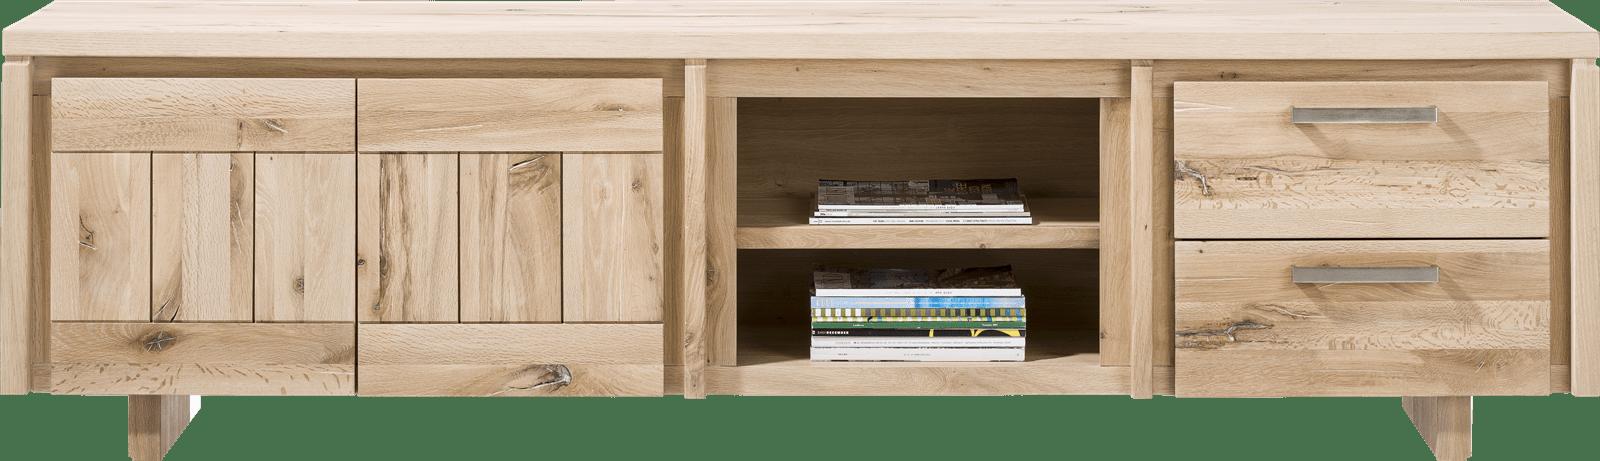 More - lowboard 220 cm - 2-deuren + 2-laden + 2-niches - hout